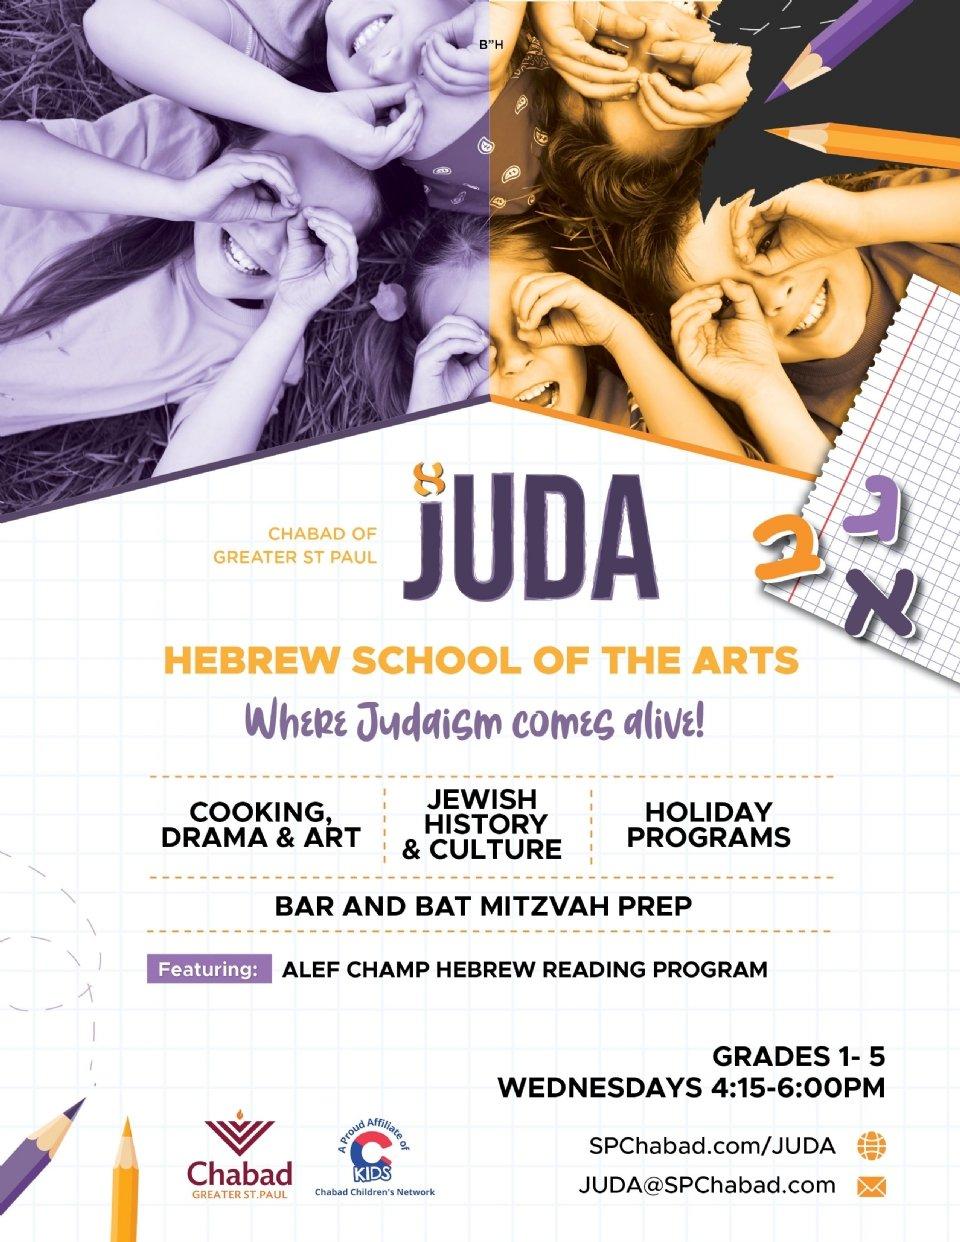 Juda Hebrew school of the arts.jpg